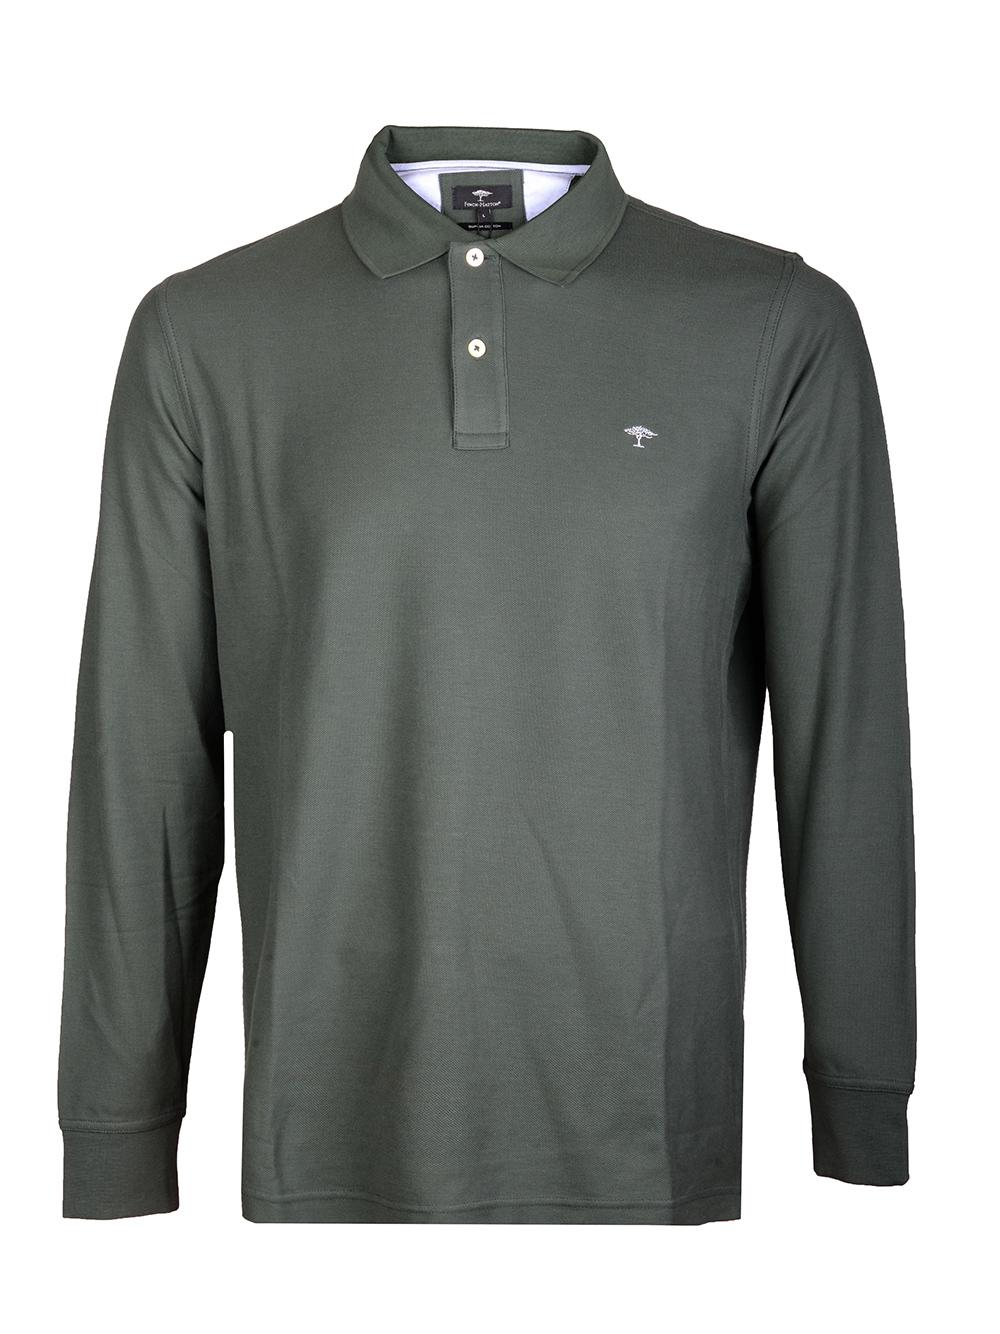 FYNCH-HATTON Μπλούζα Polo 1220 1701-746 ΠΡΑΣΙΝΟ